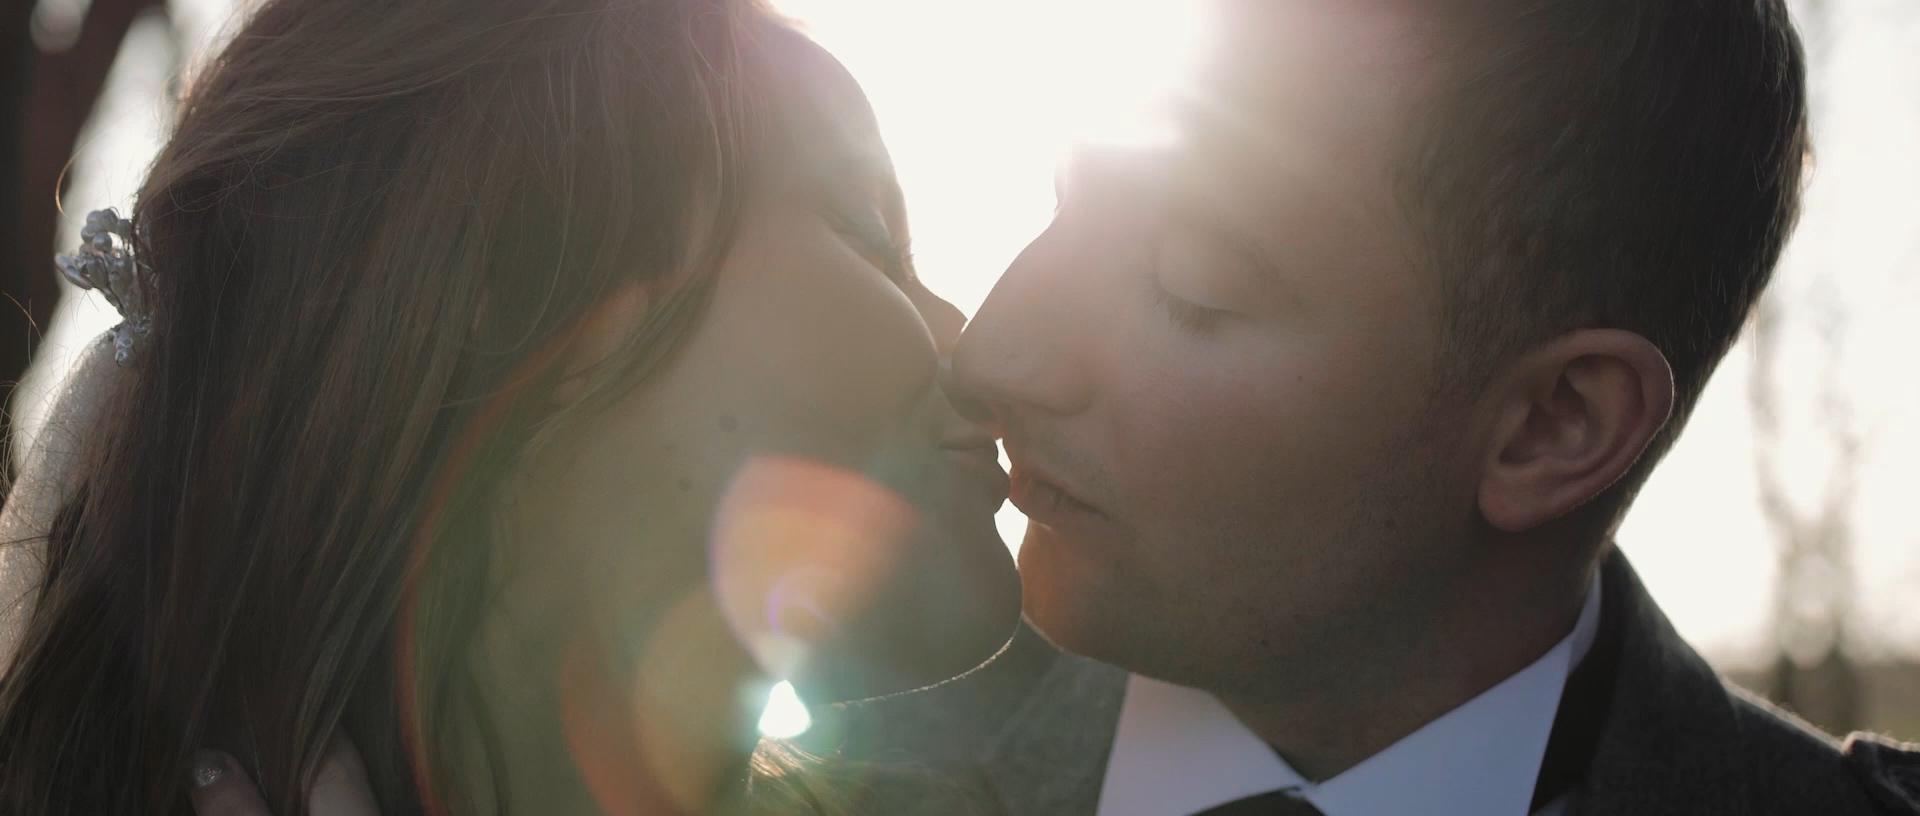 gleddoch-hotel-wedding-videographer_LL_03.jpg